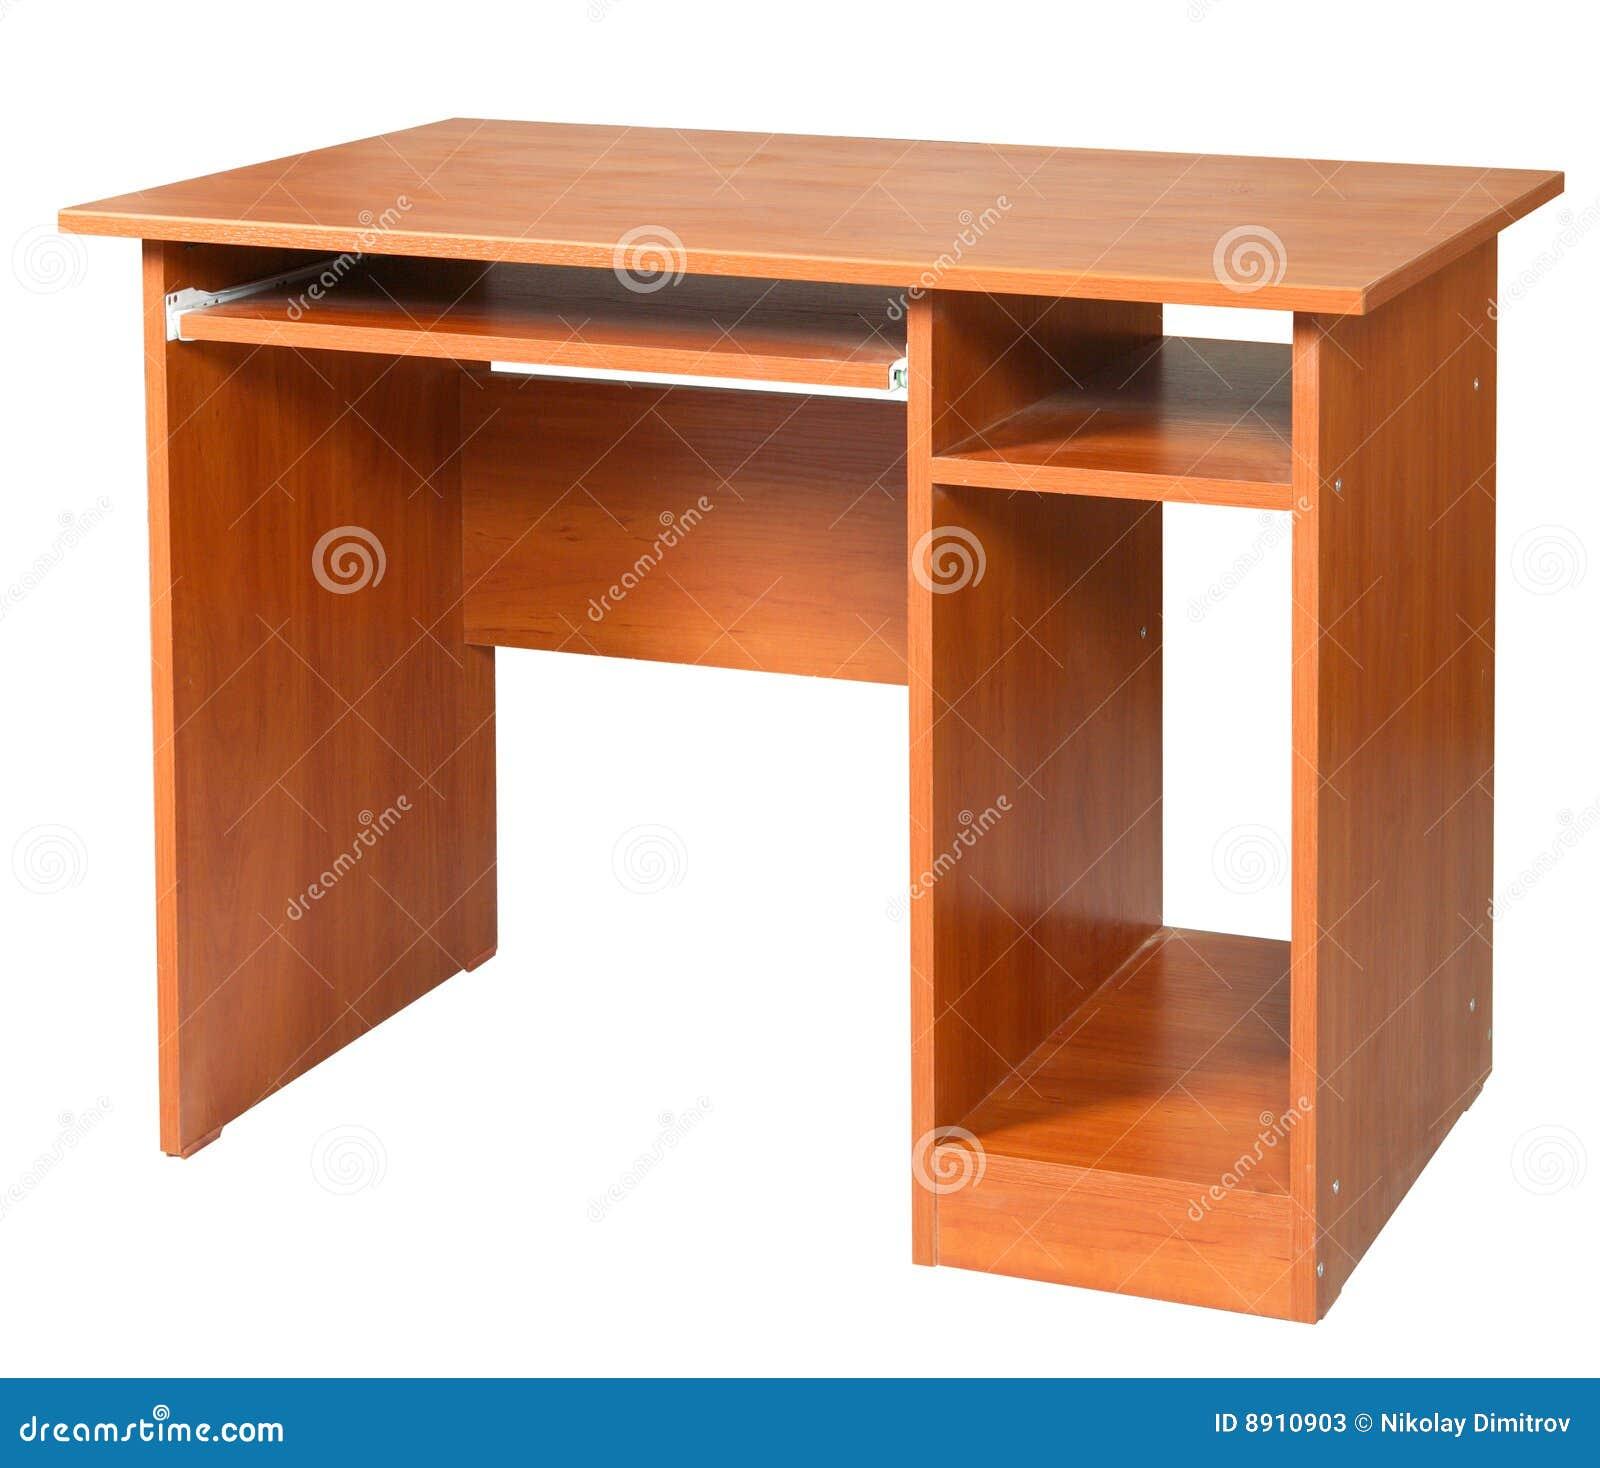 office bureau chippendale mahogany english partners desk. Black Bedroom Furniture Sets. Home Design Ideas